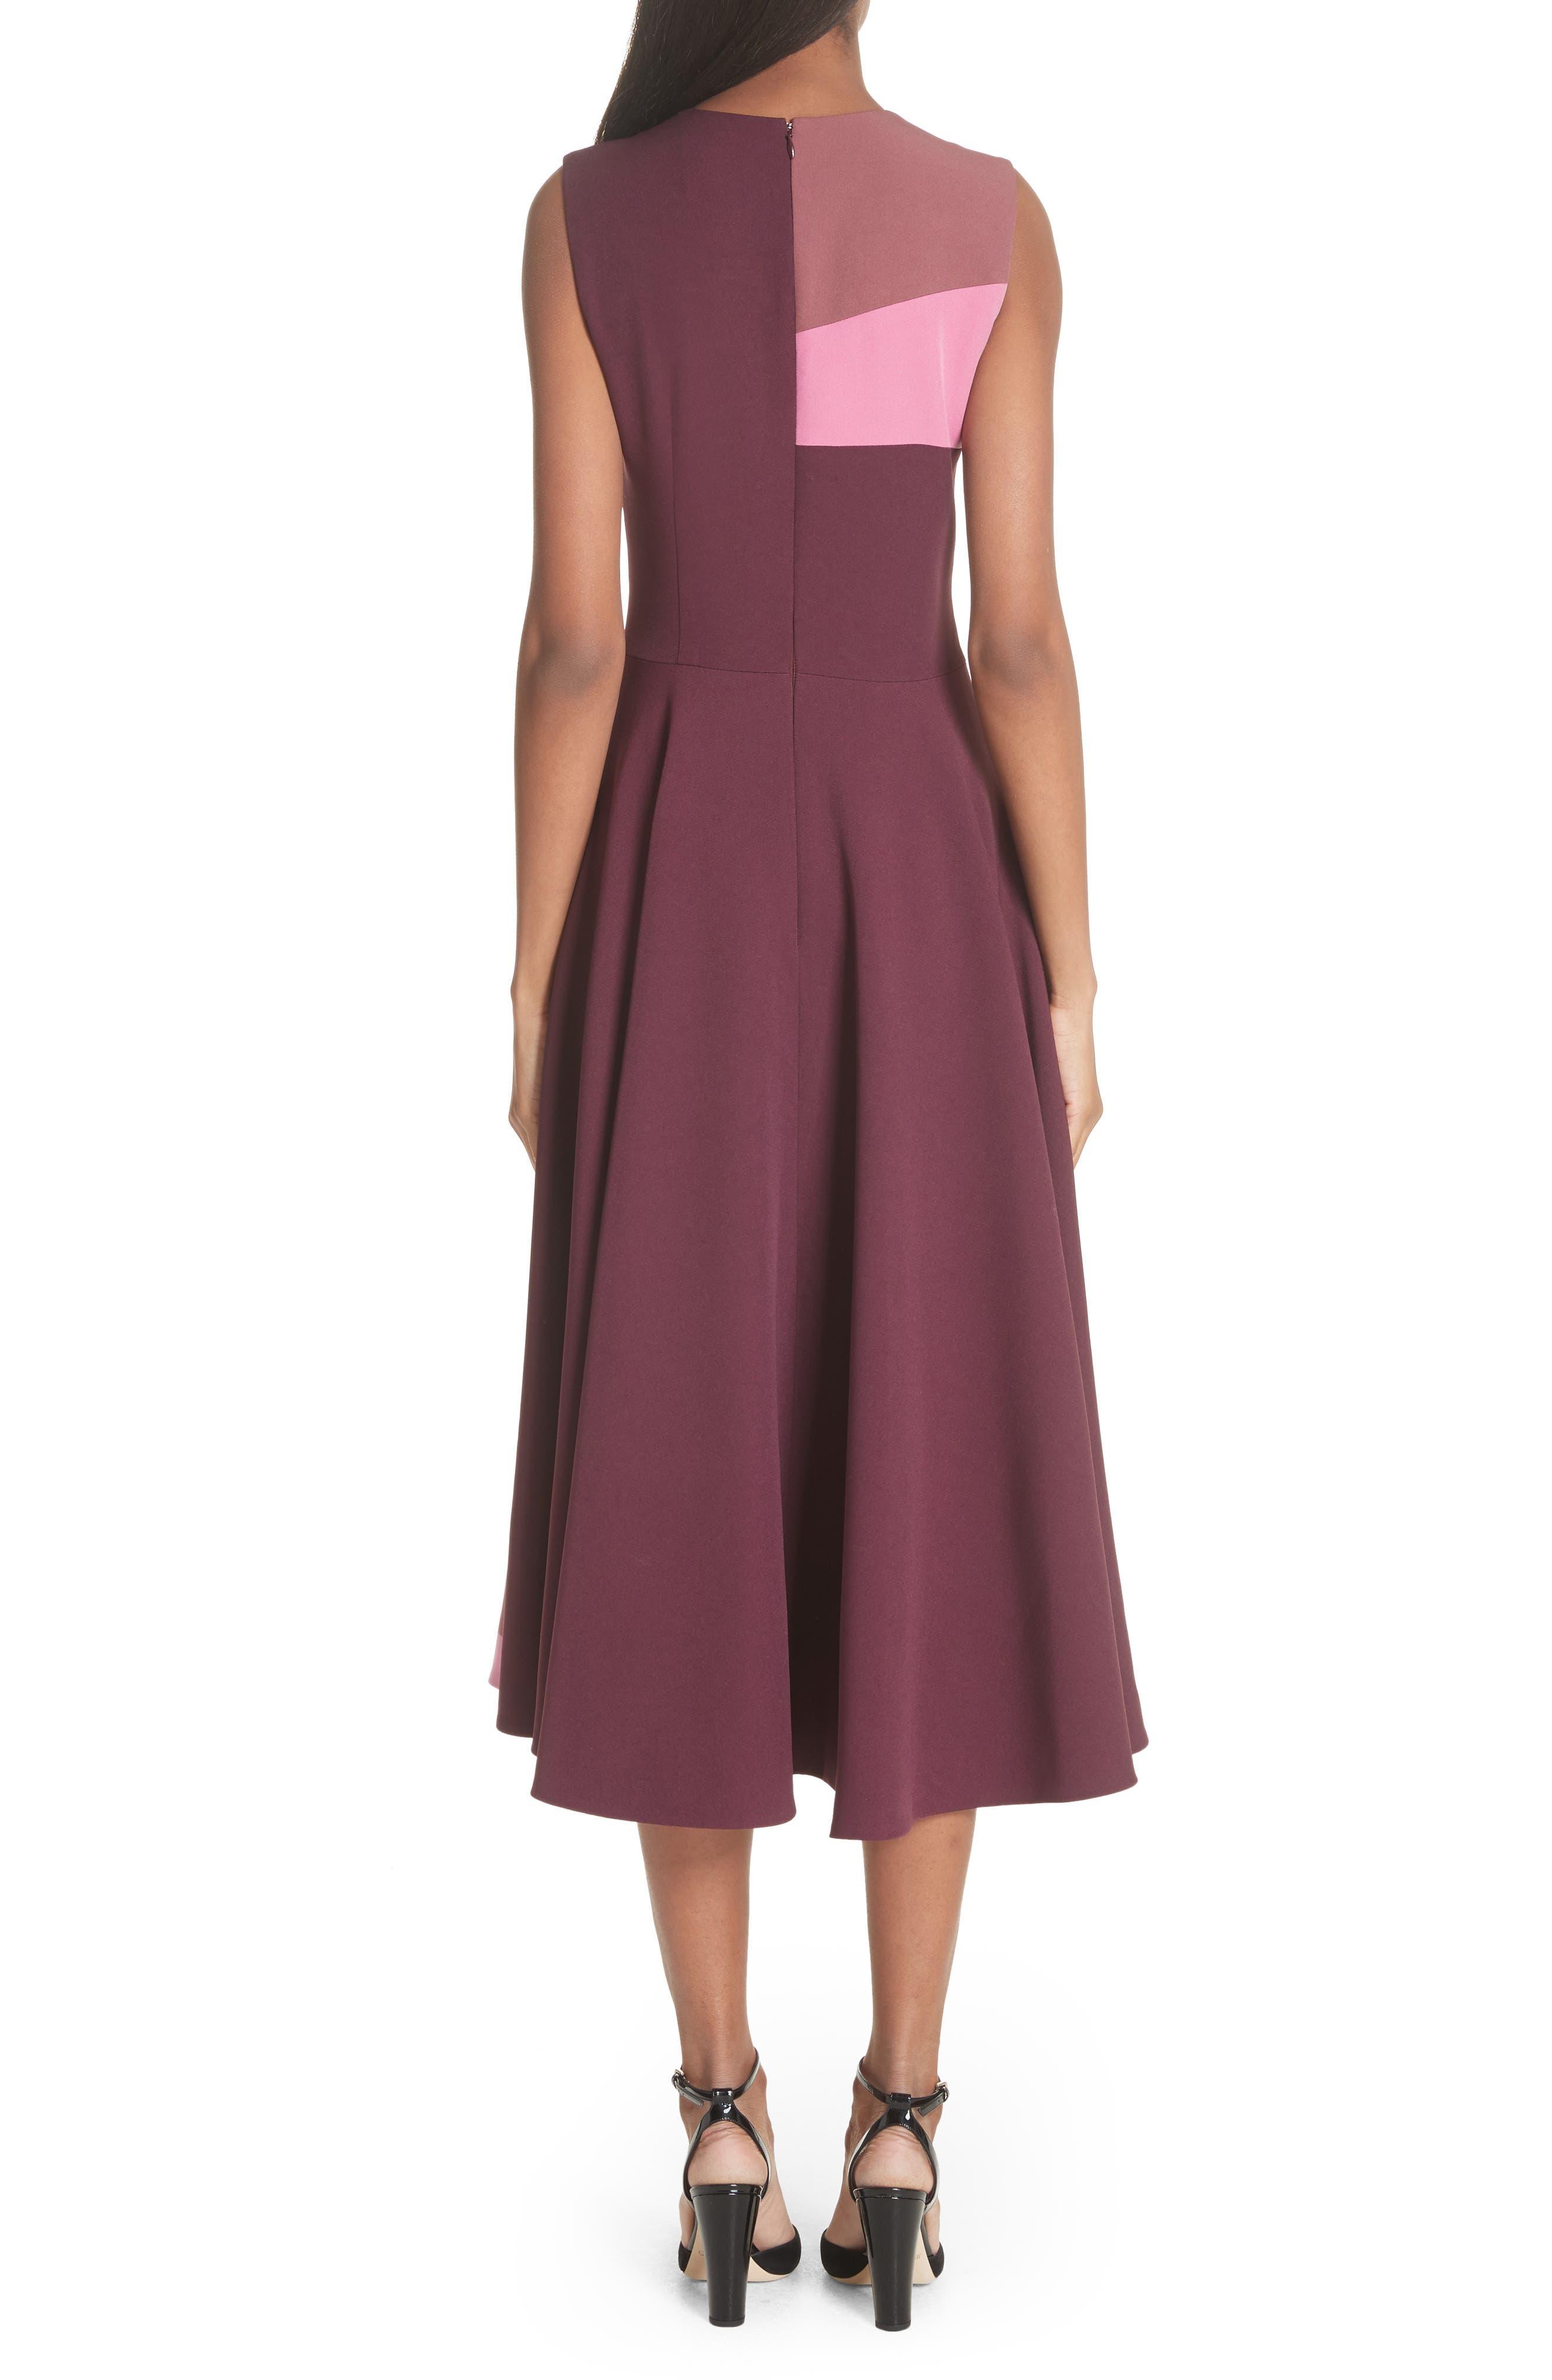 Tatum Stripe Paneled Fit & Flare Dress,                             Alternate thumbnail 2, color,                             Plum/ Blossom/ Mink